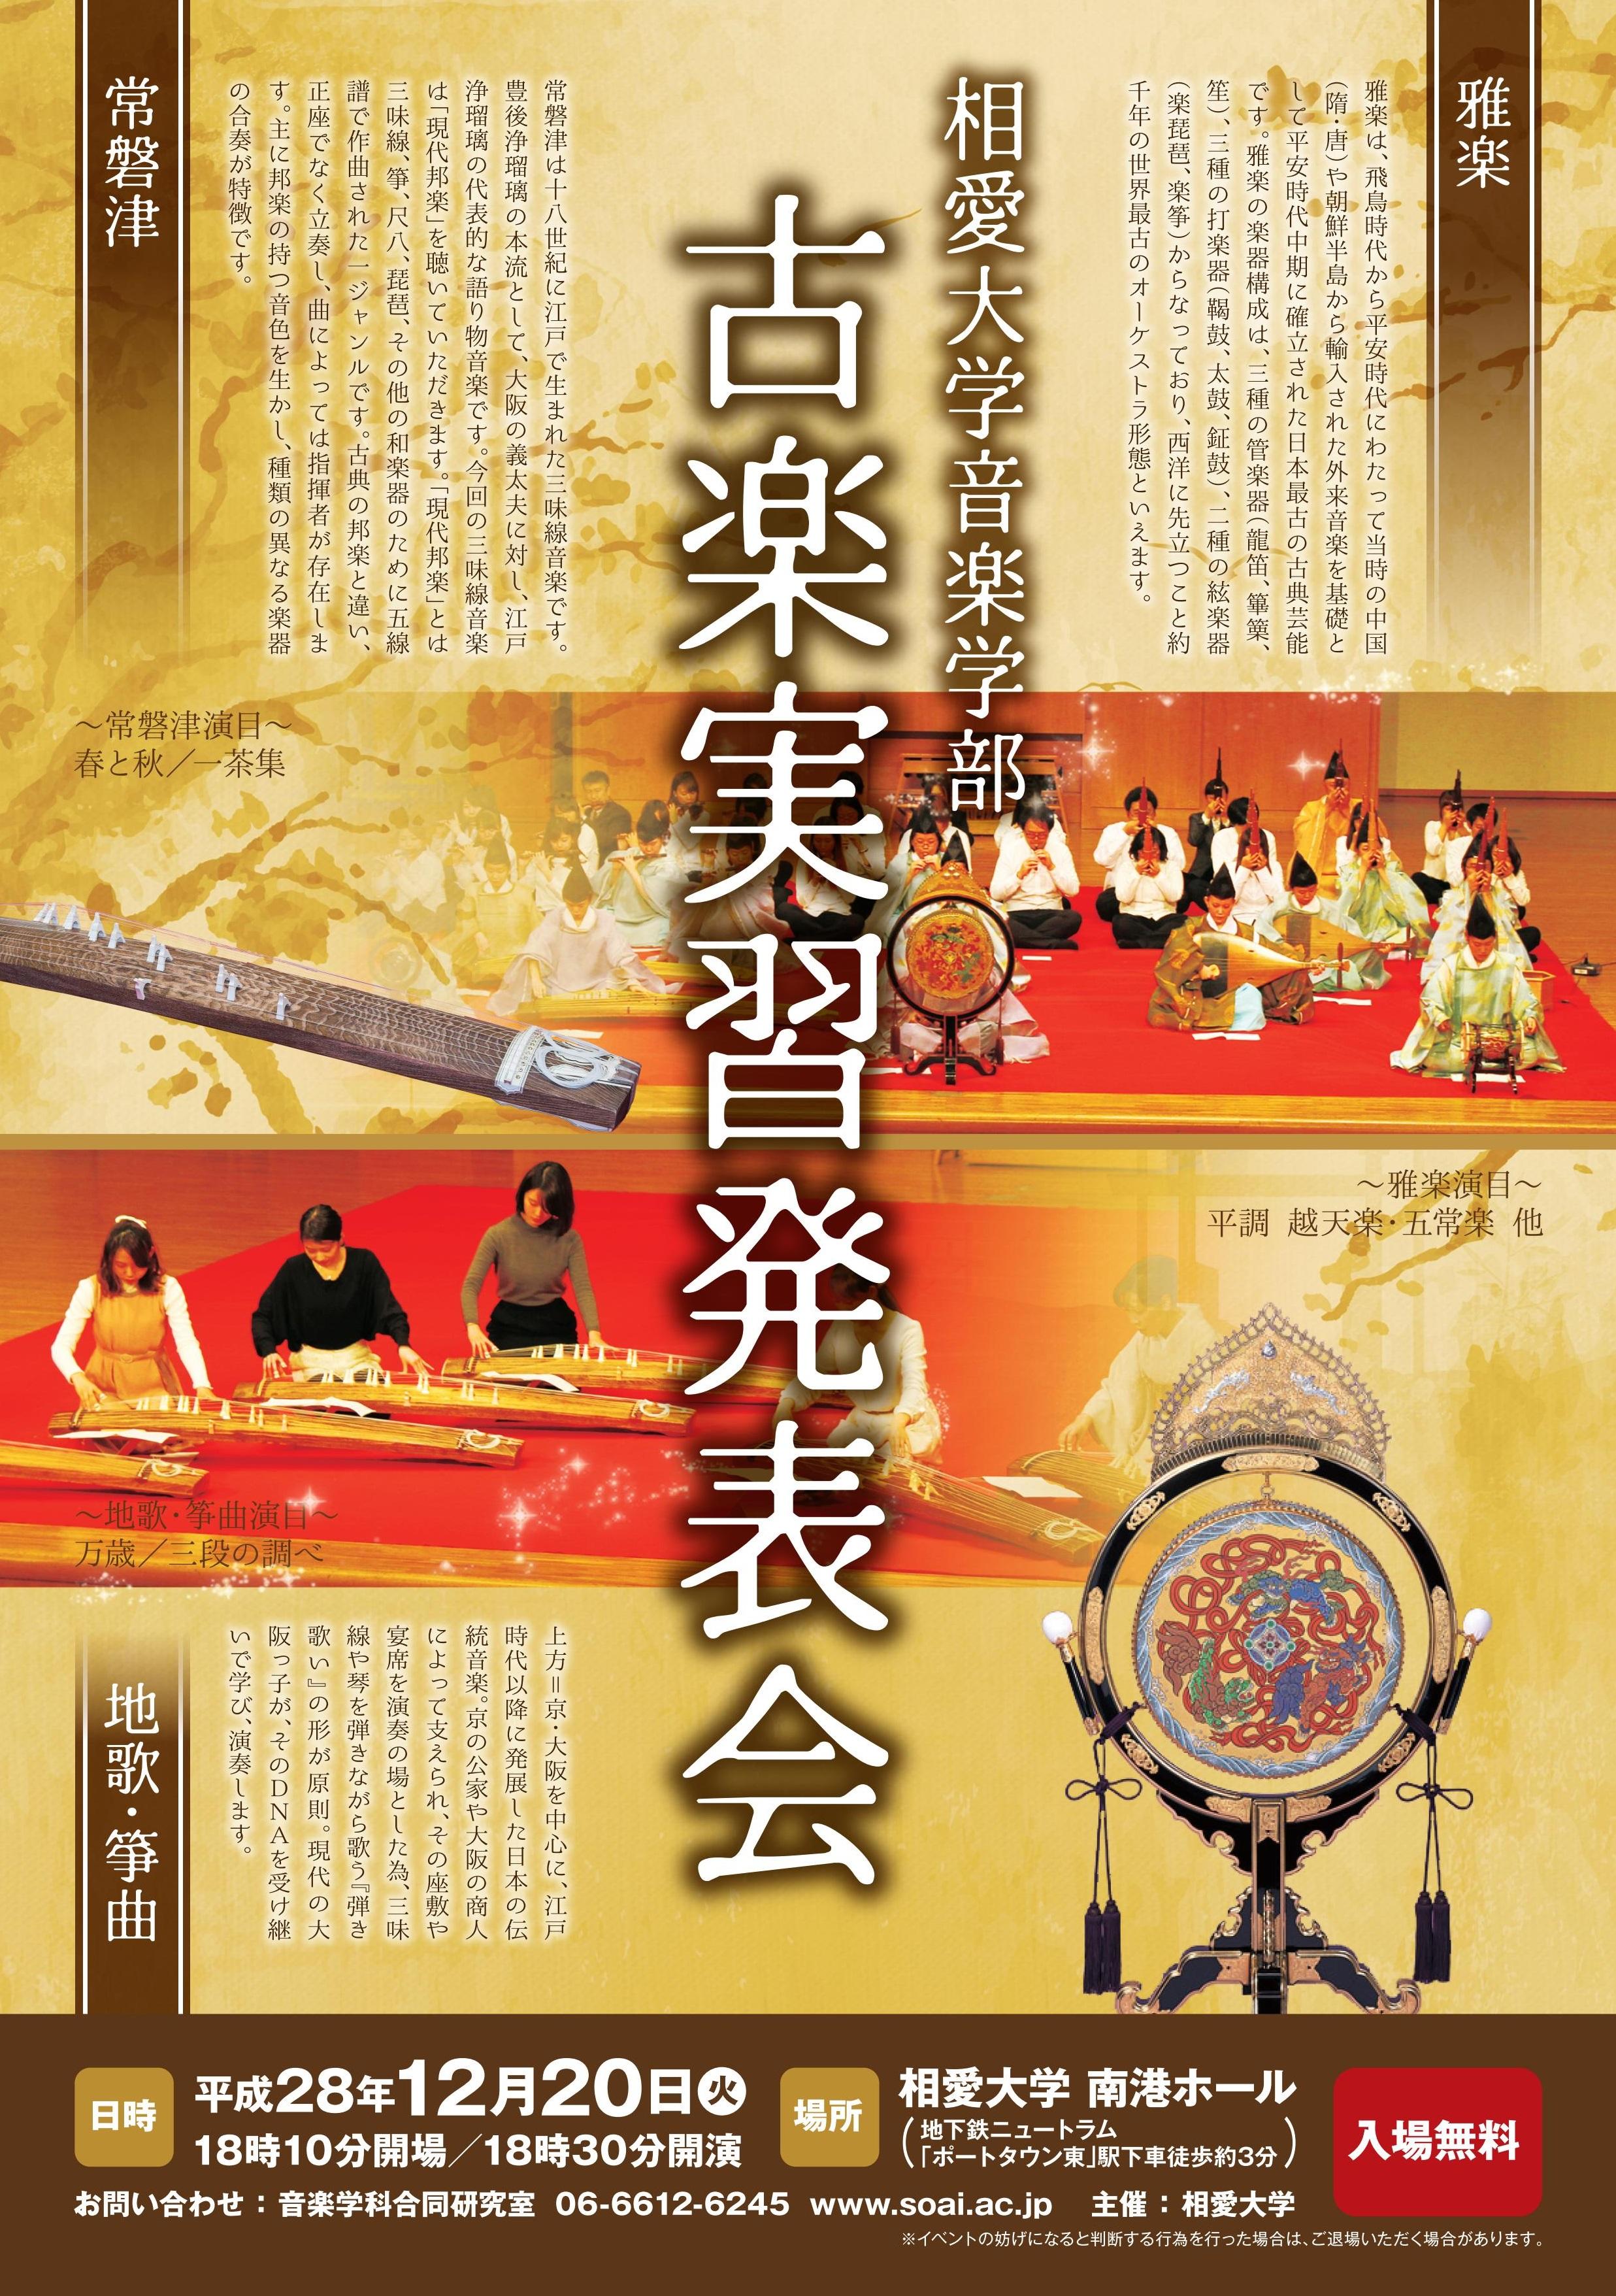 http://www.soai.ac.jp/information/concert/20161222_kogaku2.jpg